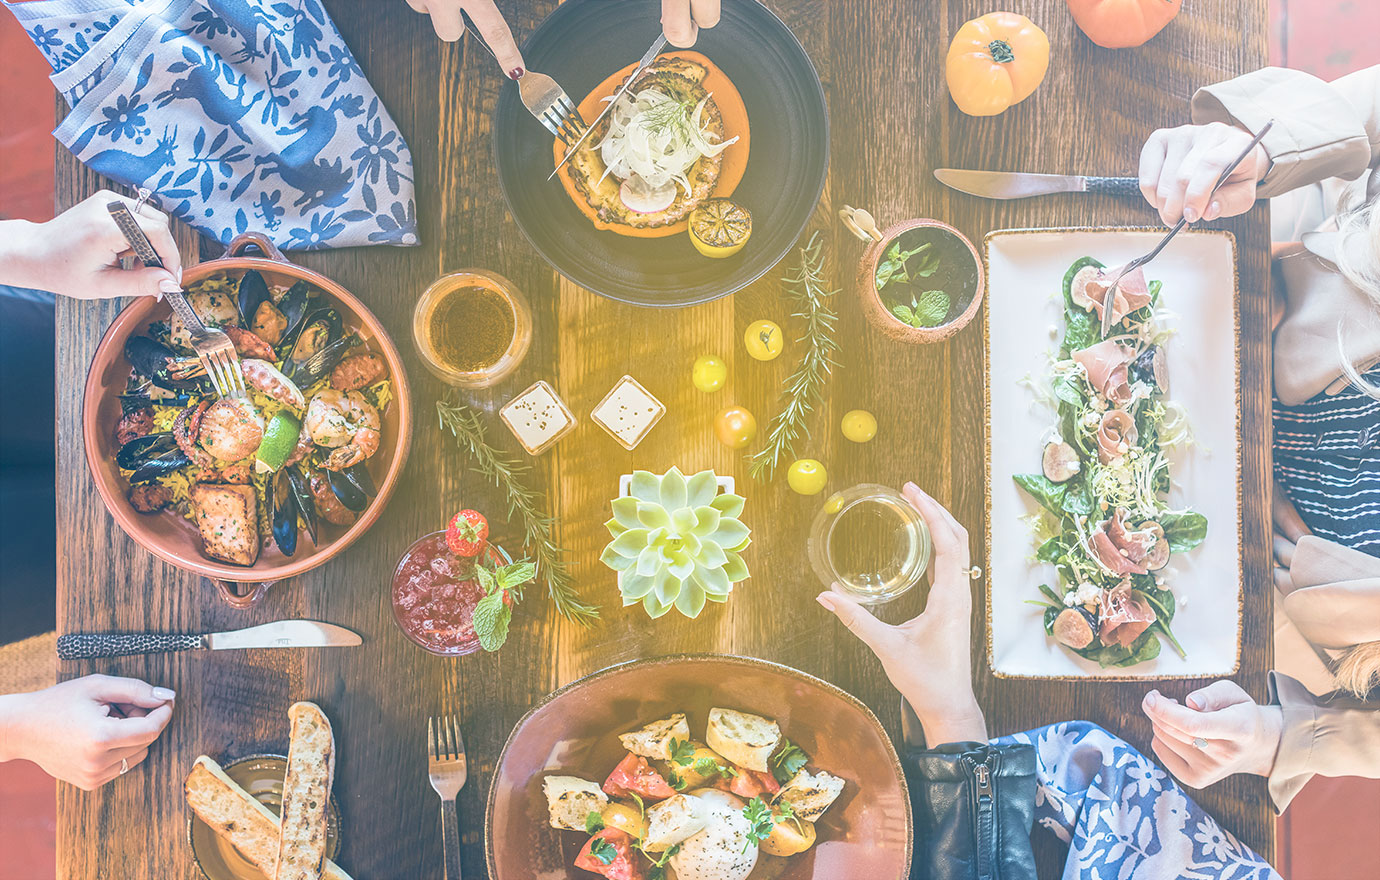 Enjoy Coastal-Inspired Cuisine at